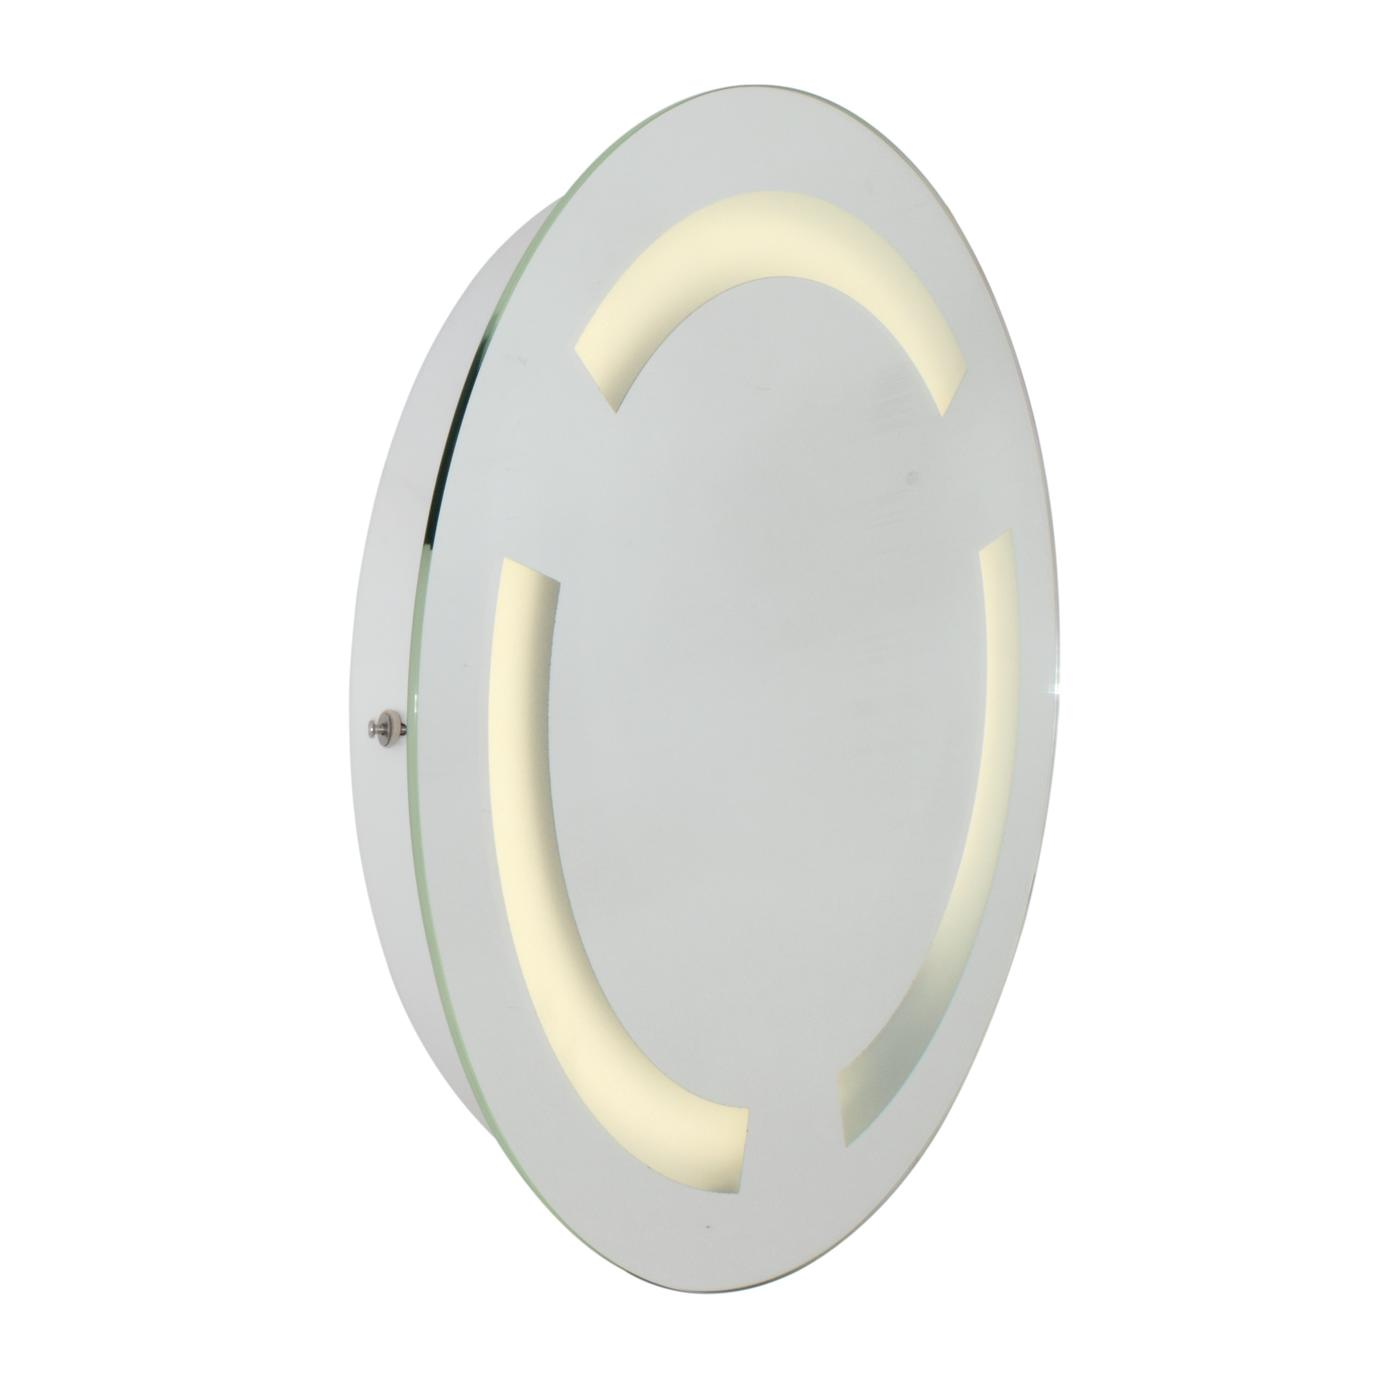 Mirrors And Bathroom Cabs Bathroom Leroy Merlin South Africa